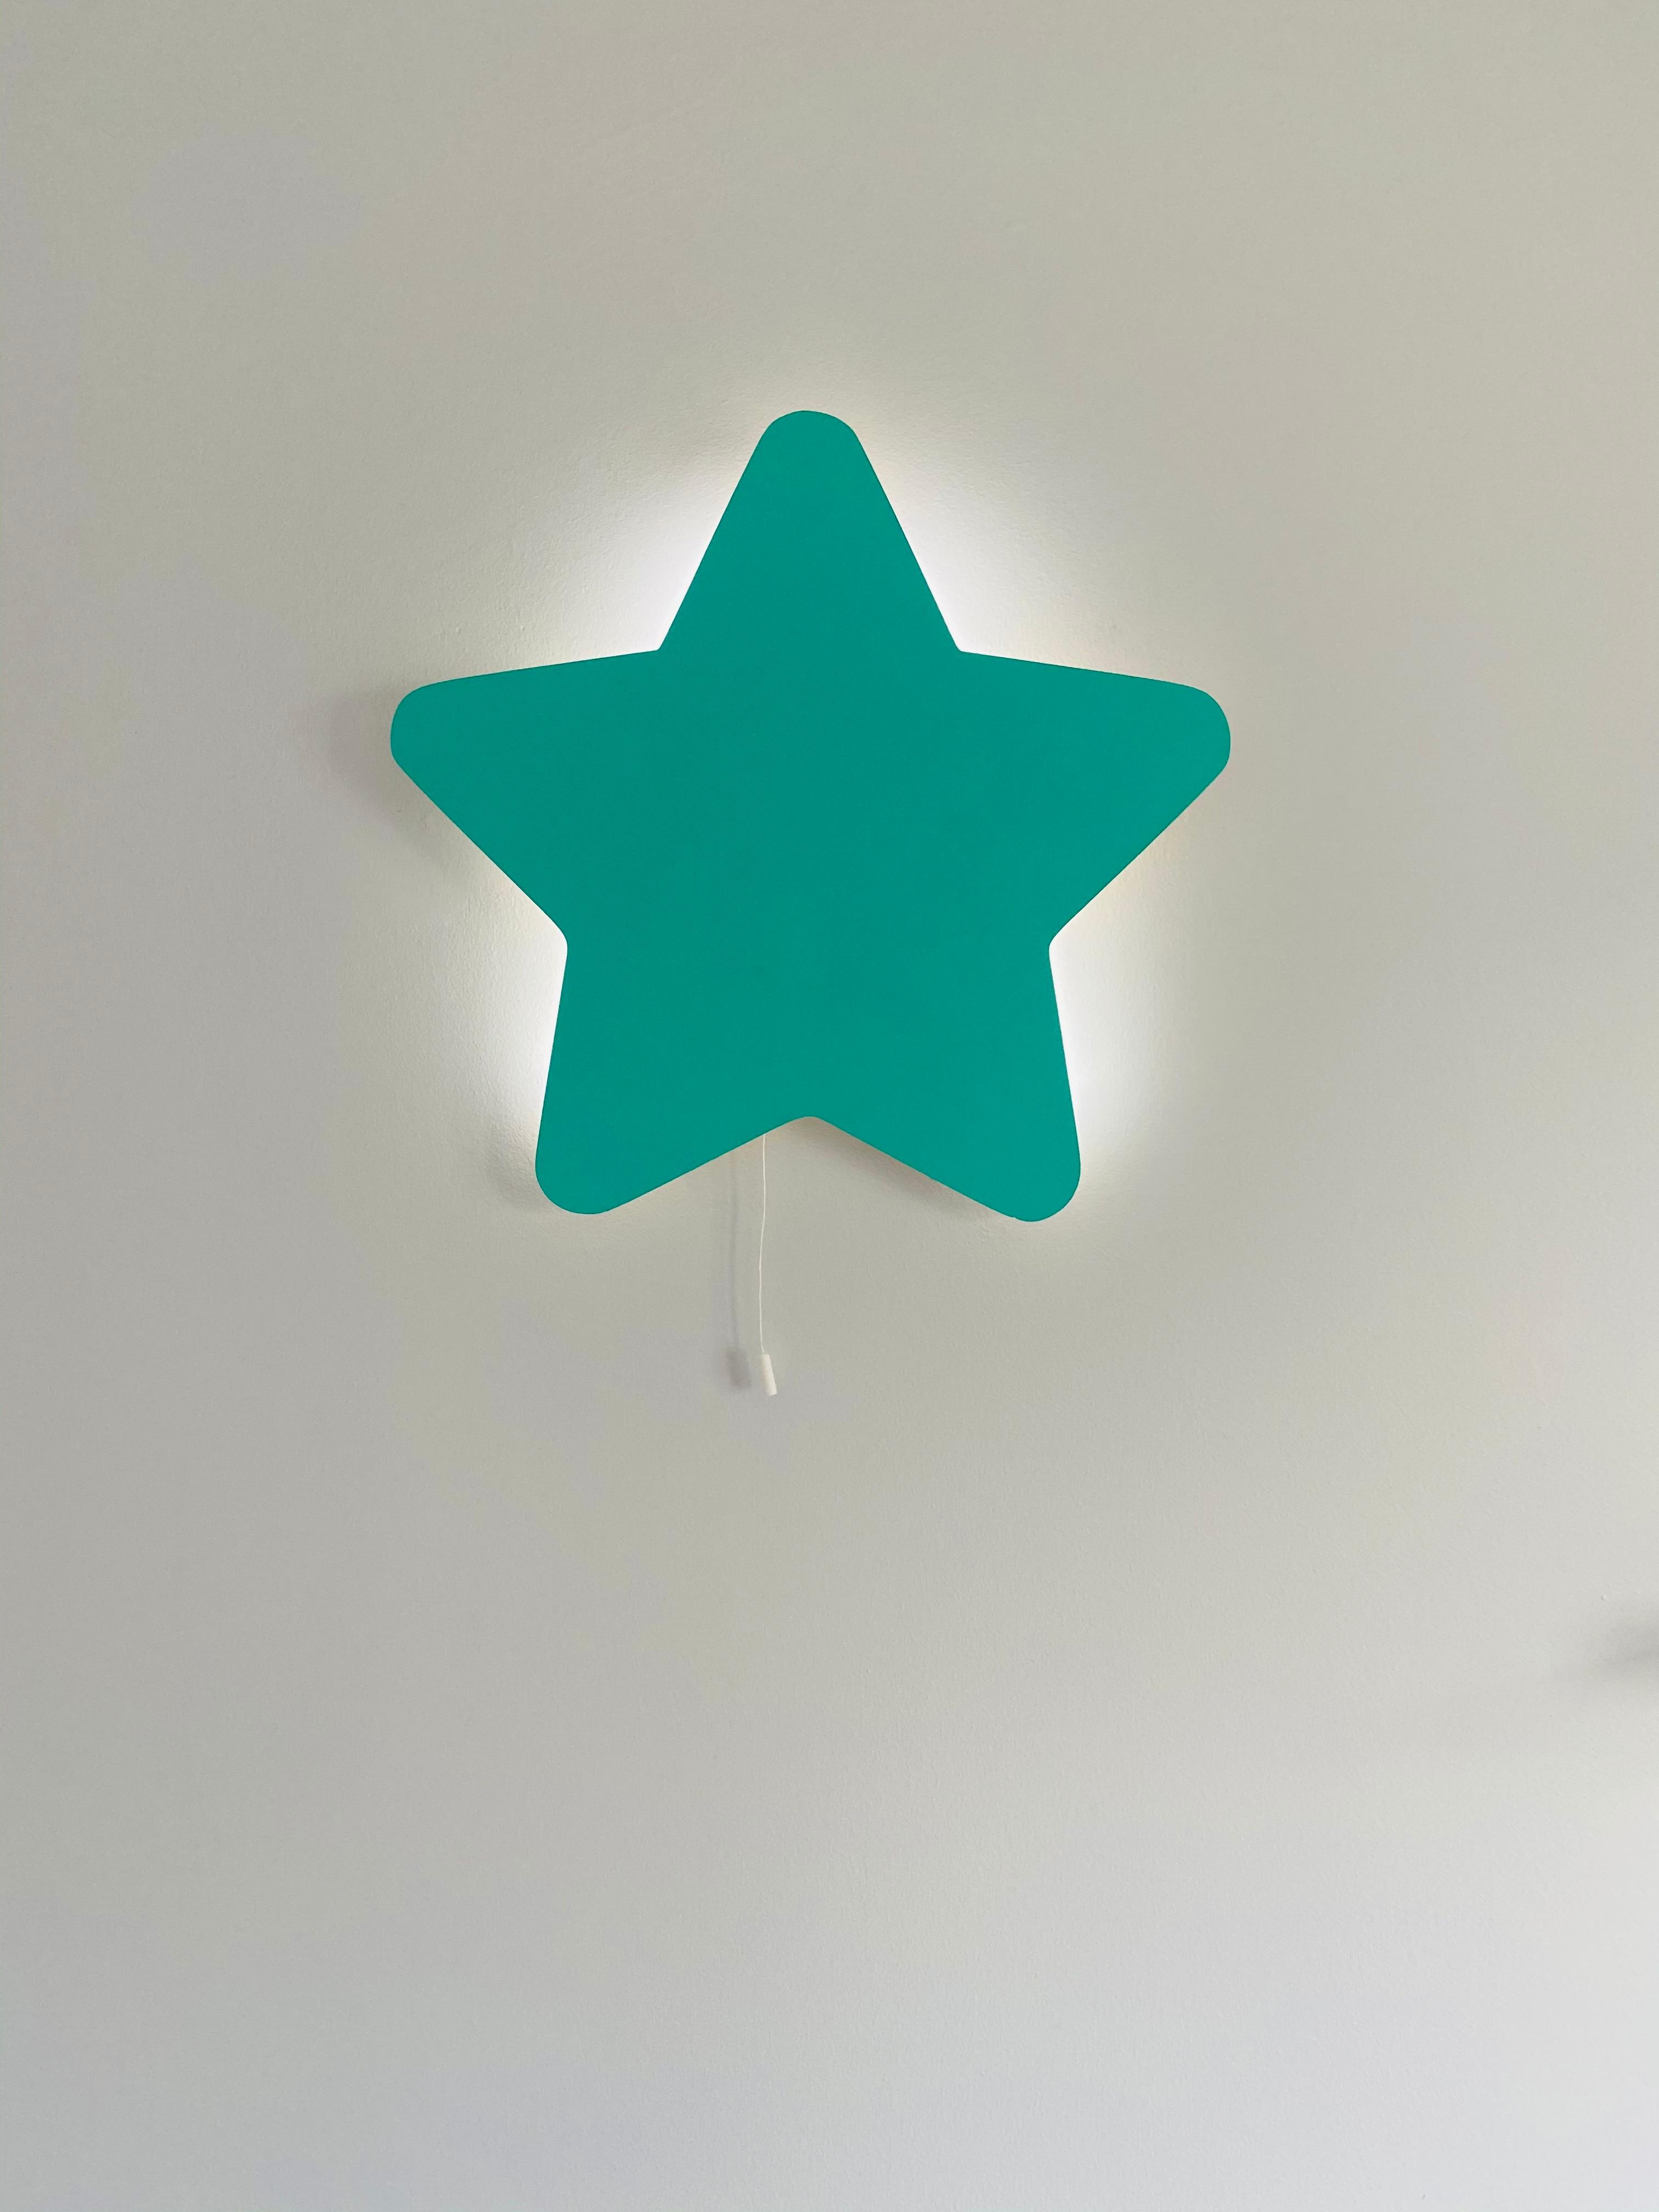 Set of 2- Baby Night Lamp Set, Cloud Lamp, Star Light, Wooden Wall Light, Baby Shower Lamp, Kids Bedside Decoration enlarge